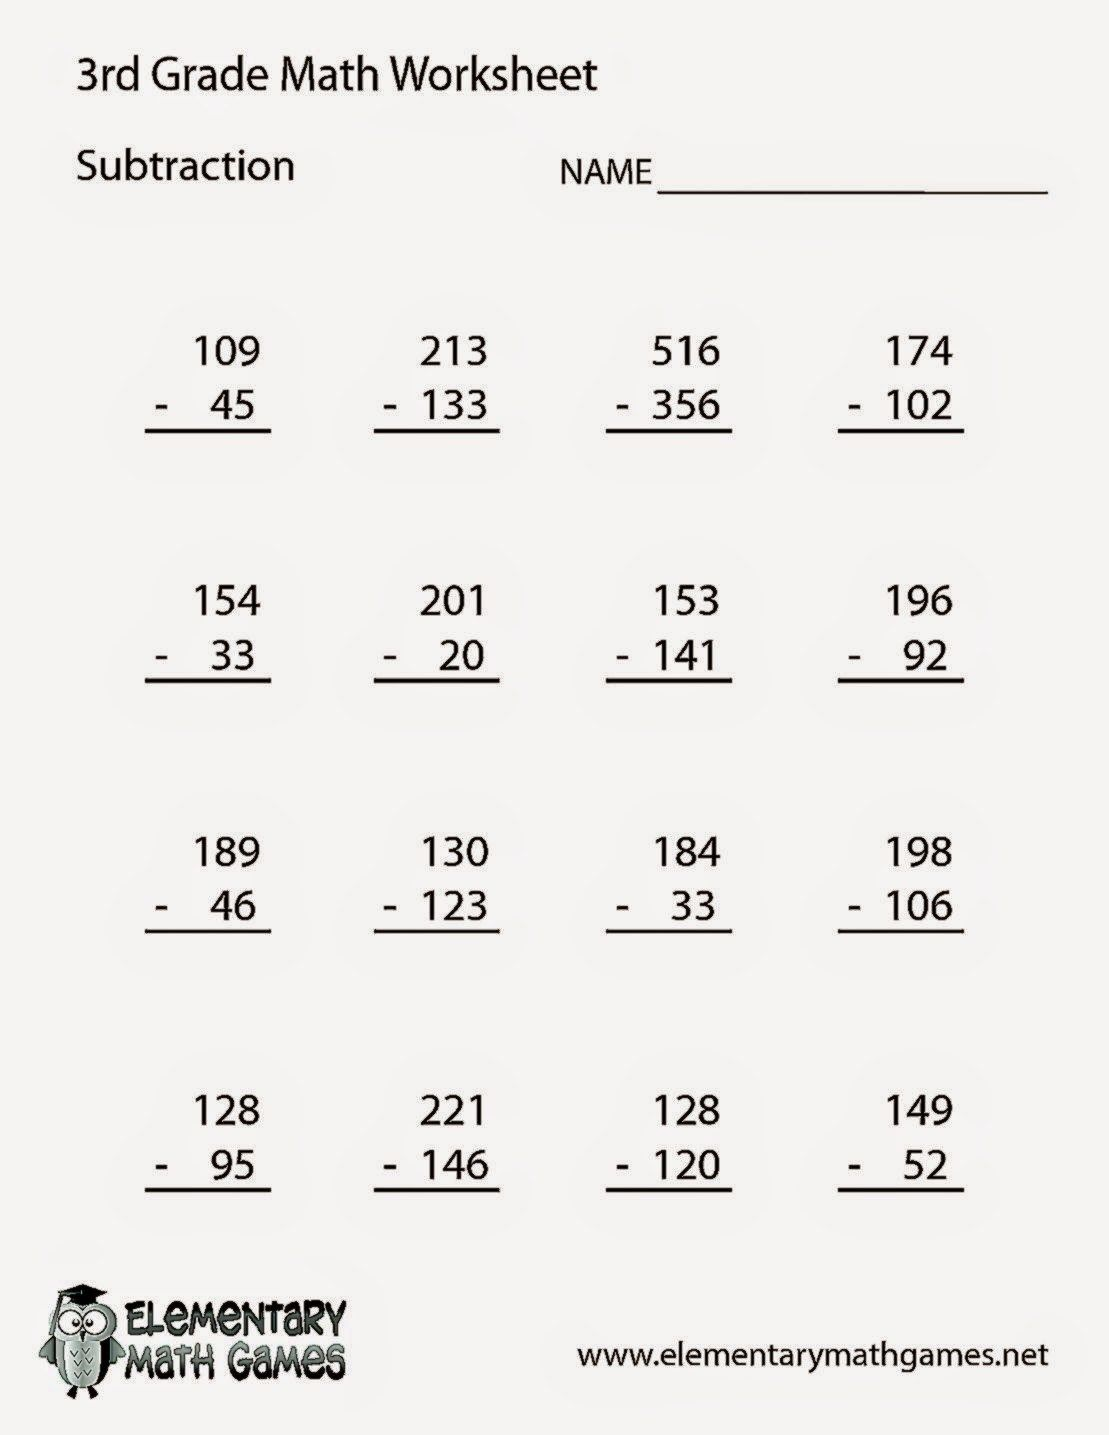 medium resolution of 7th Grade Math Homework Worksheet Printable Worksheets And   3rd grade math  worksheets